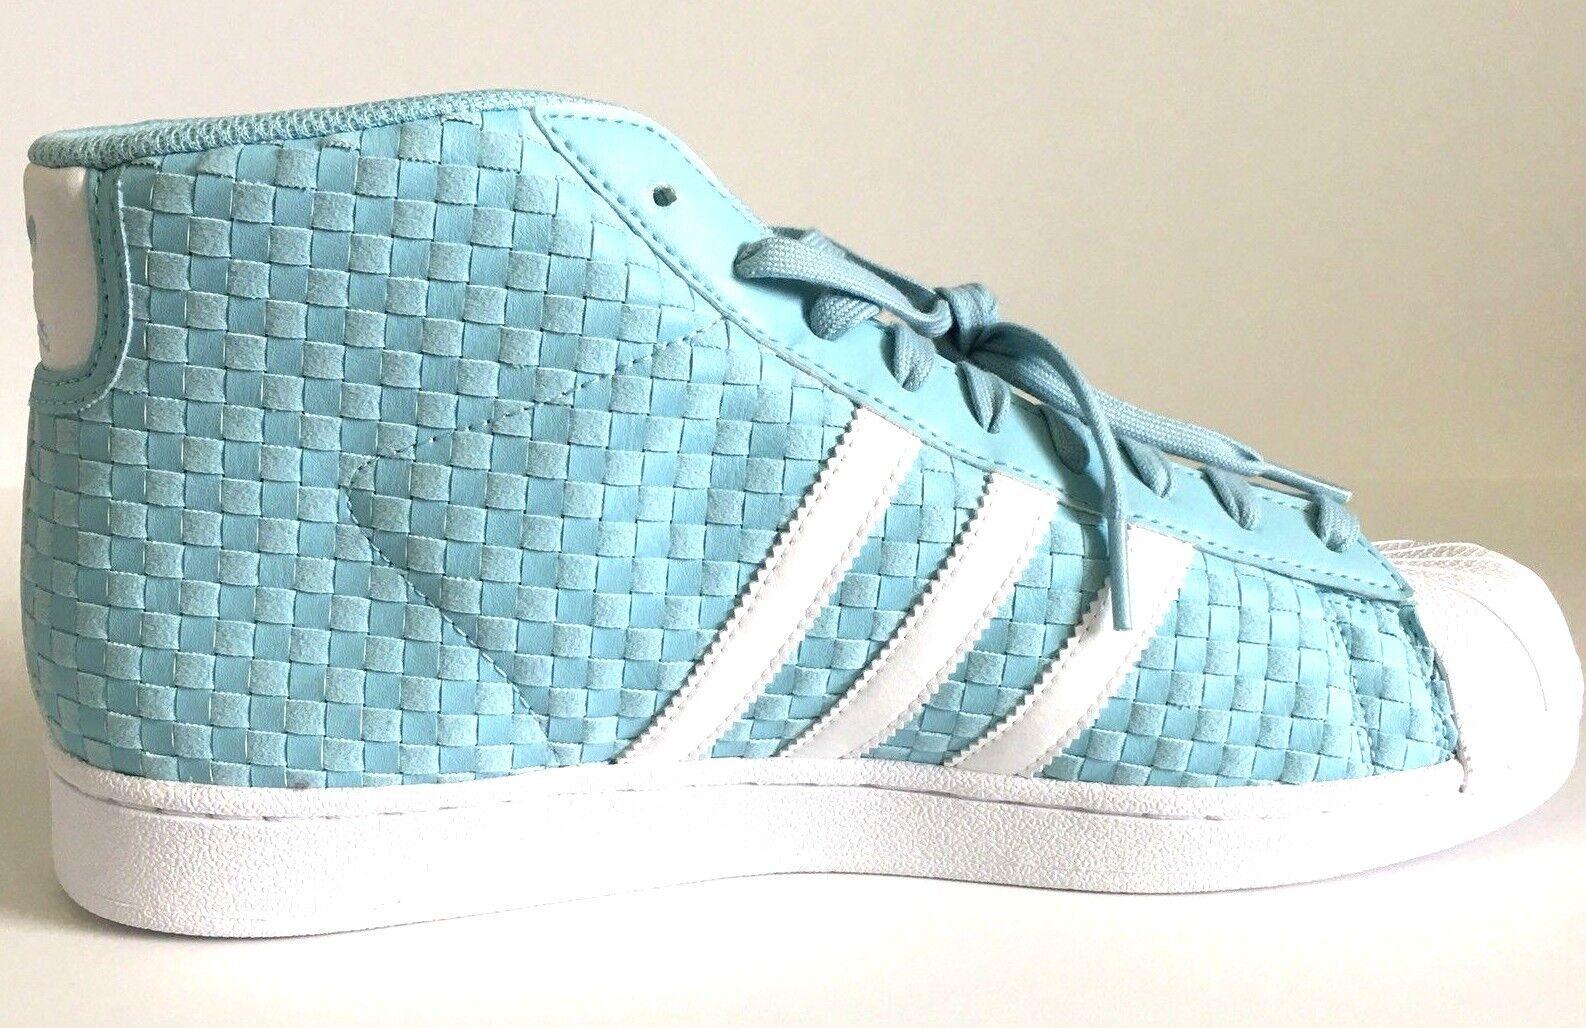 Adidas originali scarpe blu ghiaccio / bianco / 11 blu ghiaccio (by4169) numero 11 / fdb825